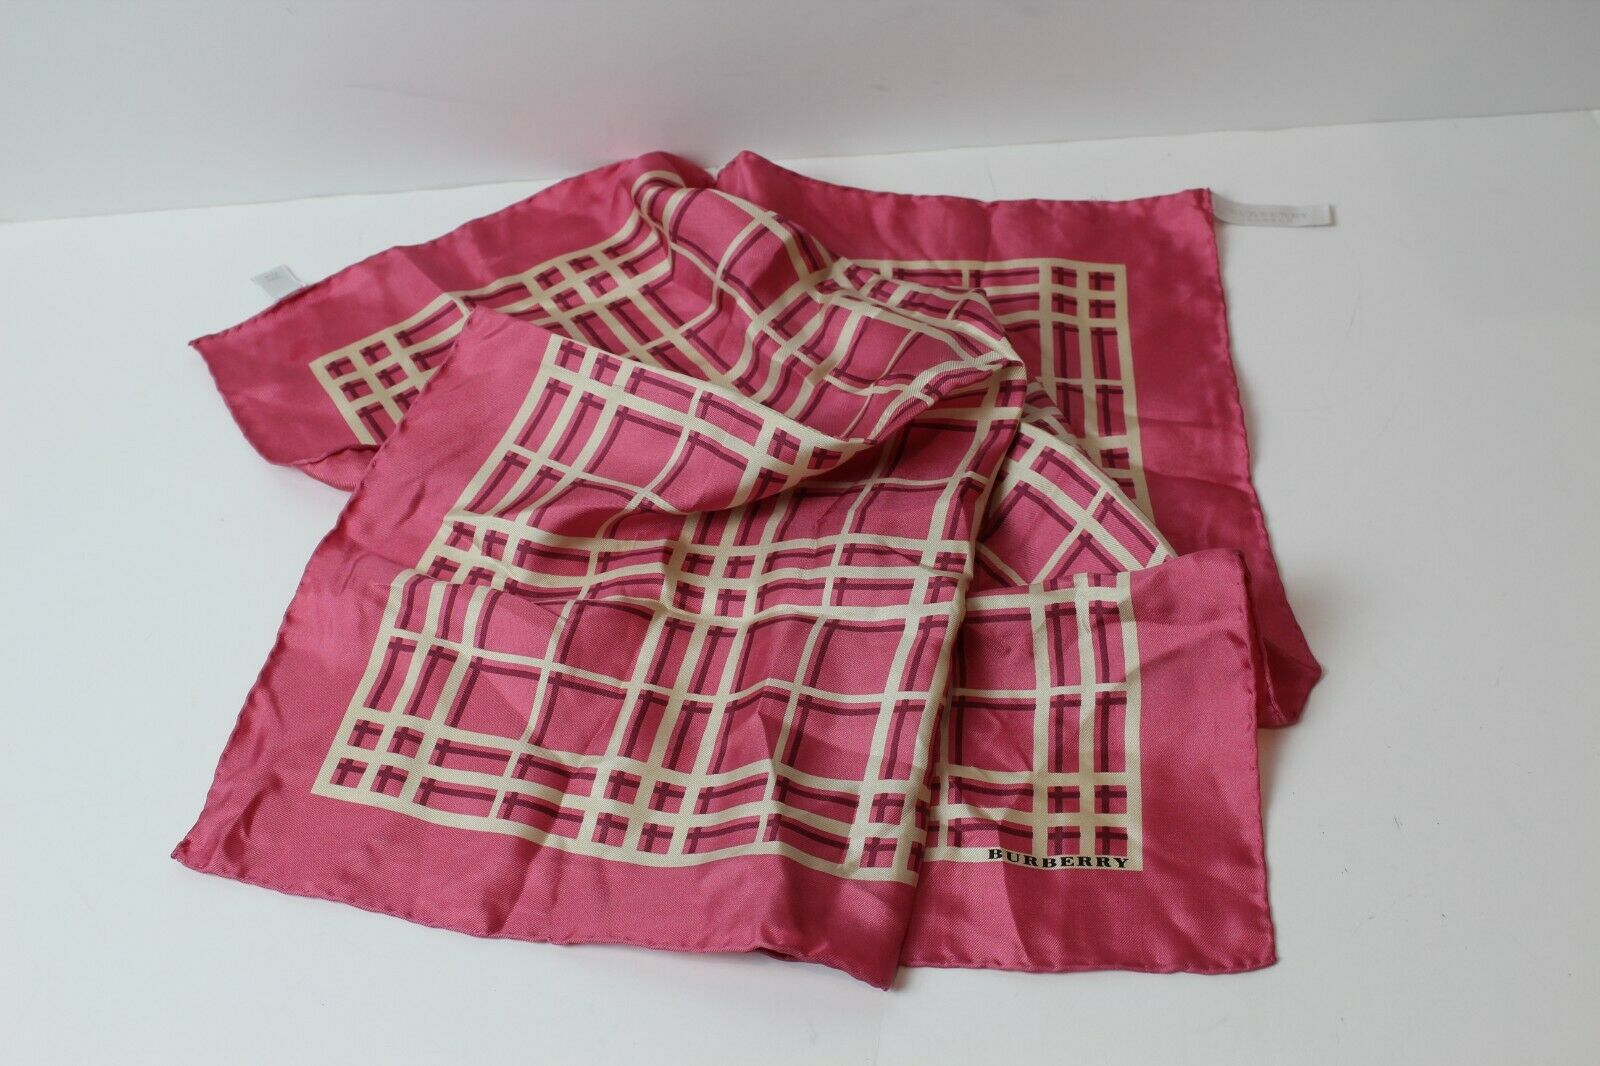 Burberry London Silk Handkerchief Pocket Bandana Plaid NovaCheck 19